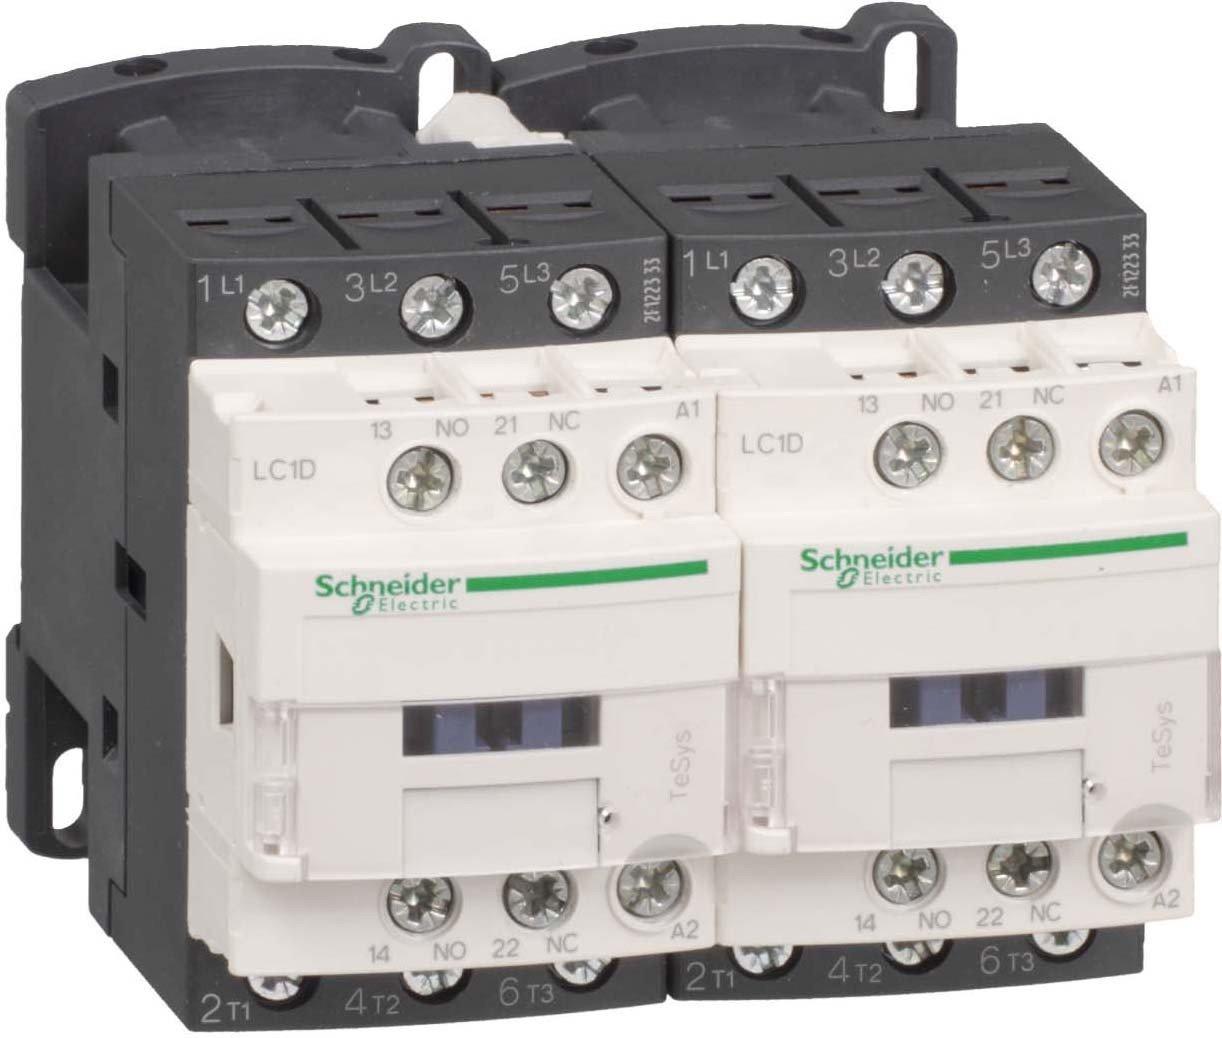 Schneider Electric LC2D25BL TeSys D Contactor Inversor, 25A 24V, Bajo Consumo Antiparasitado